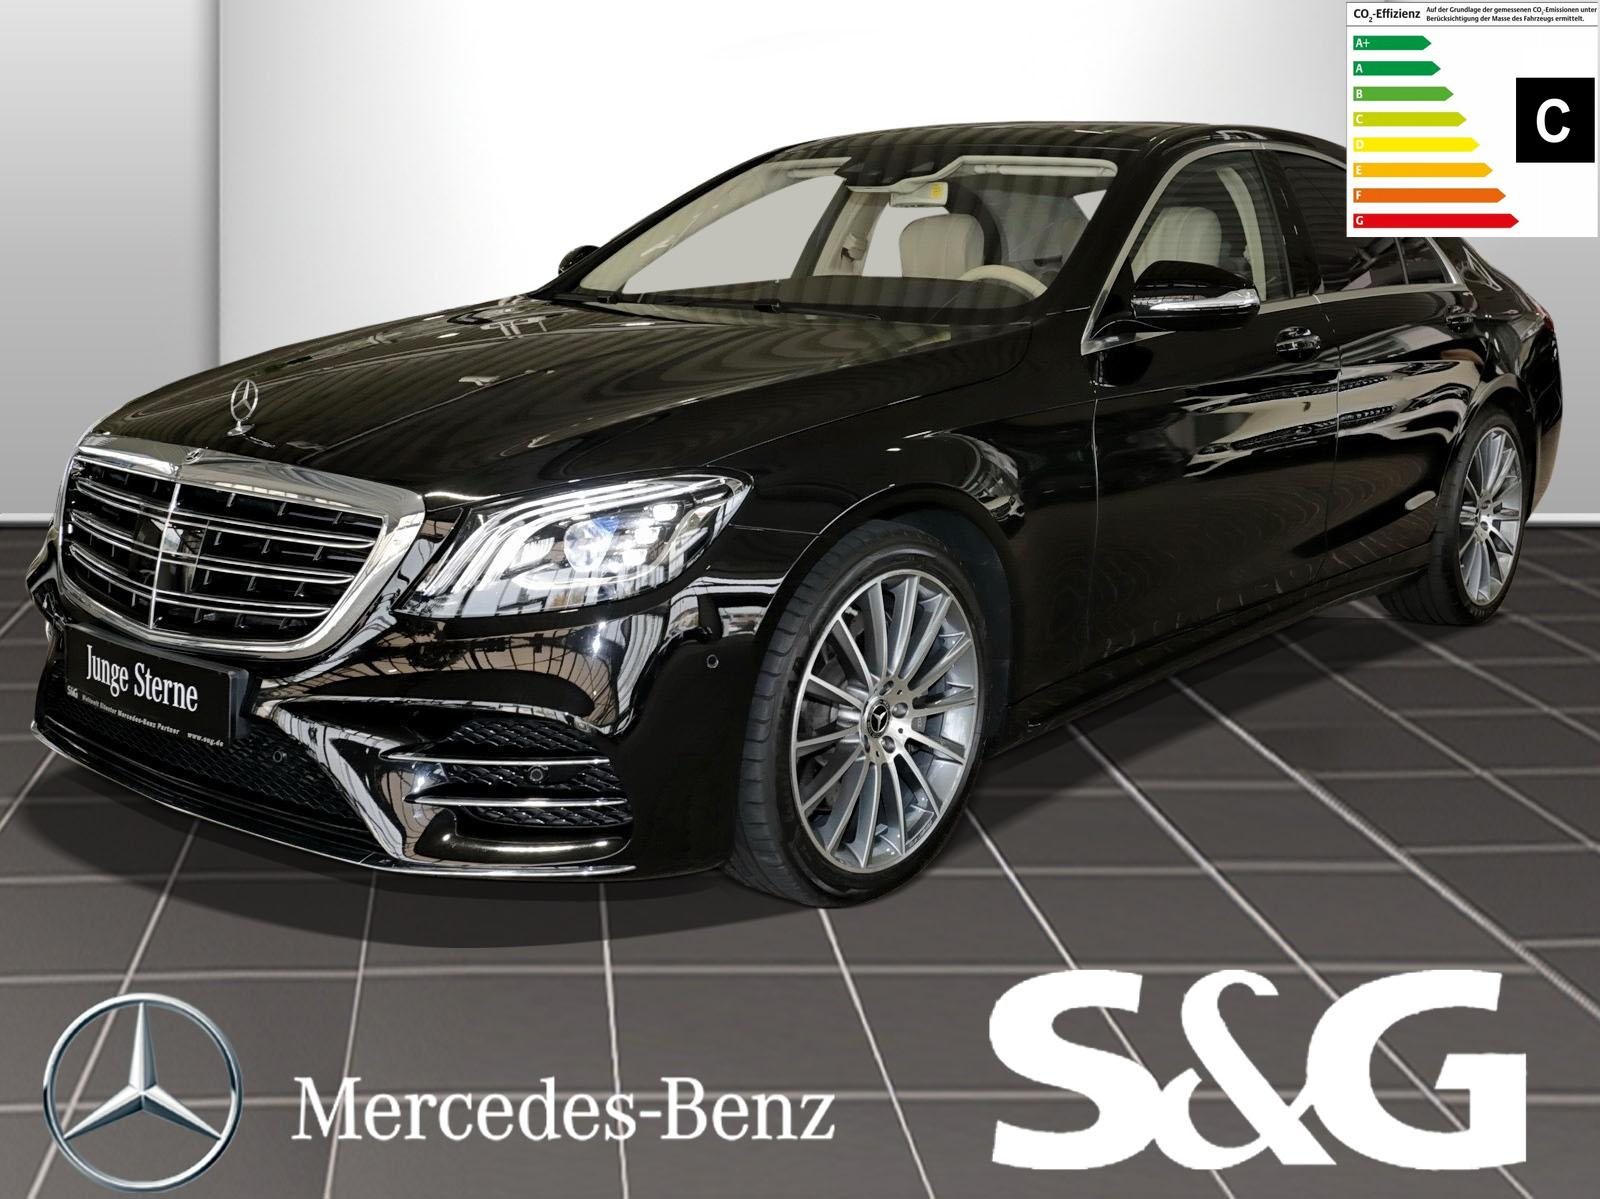 Mercedes-Benz S 560 4MATIC AMG-Line PLUS RüKam/PanoDach/COMAND, Jahr 2017, Benzin